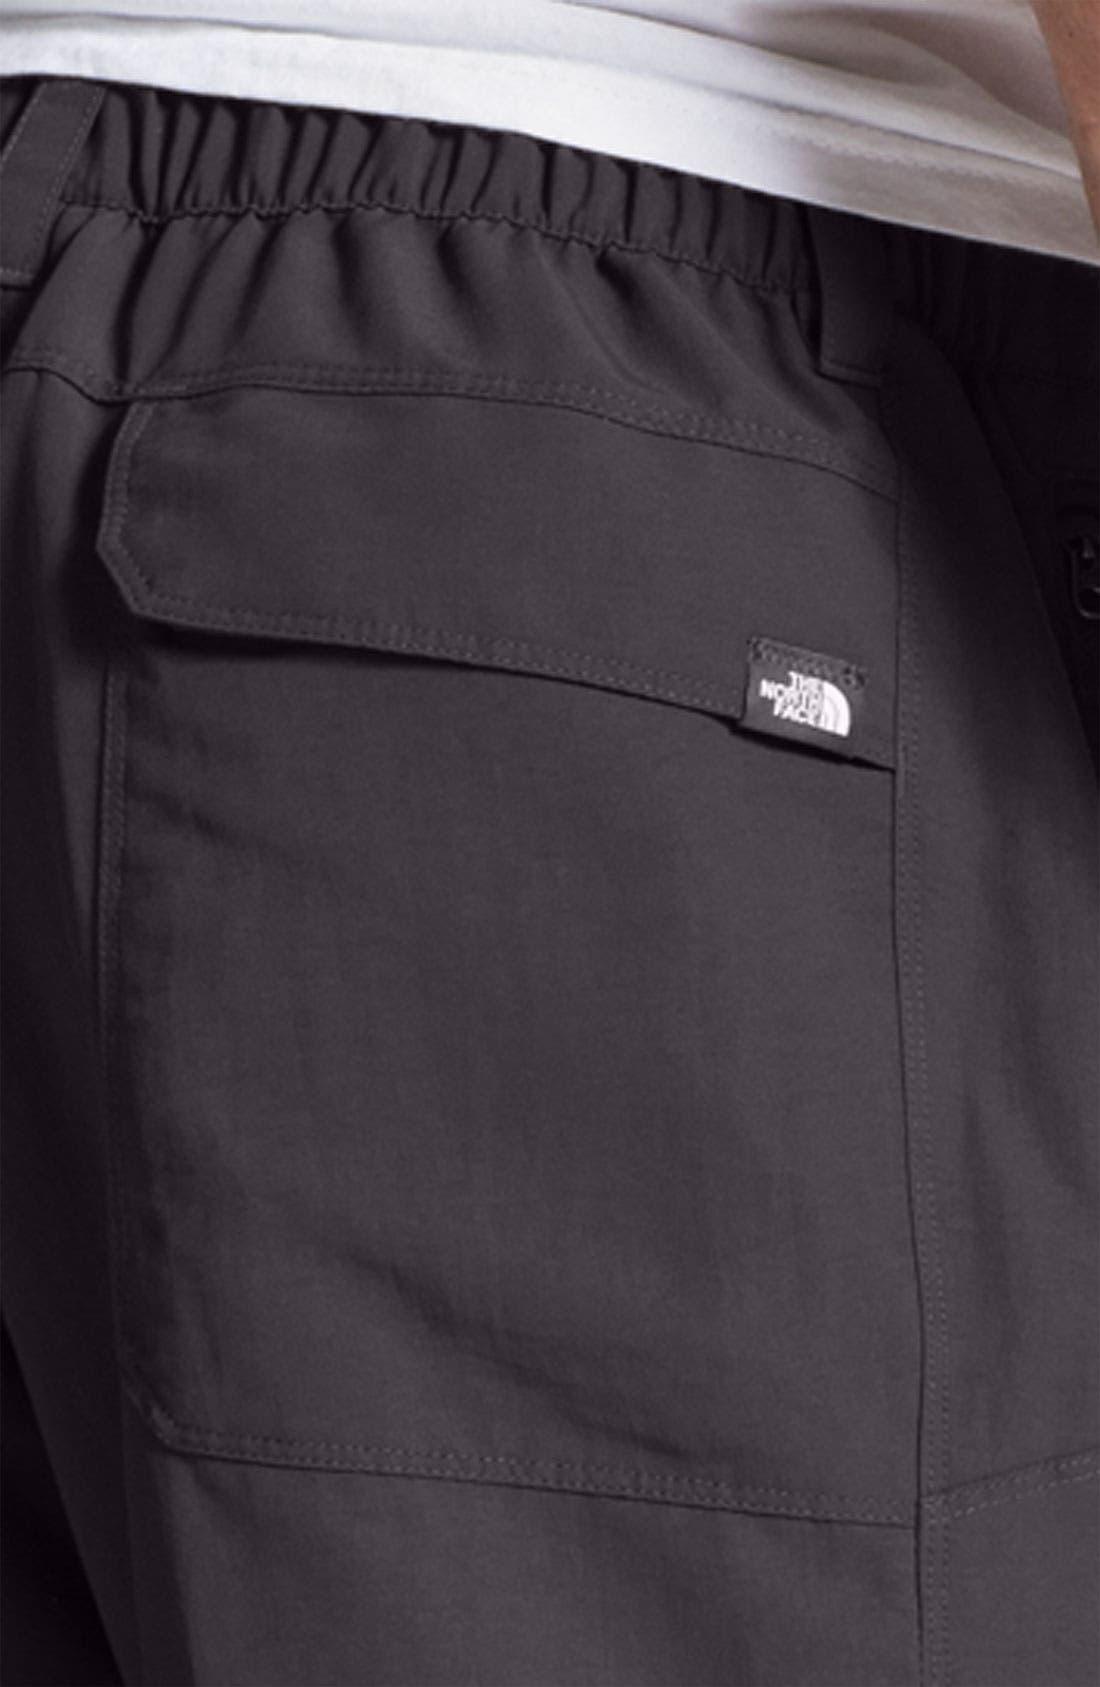 Alternate Image 3  - The North Face 'Paramount Peak' Convertible Pants